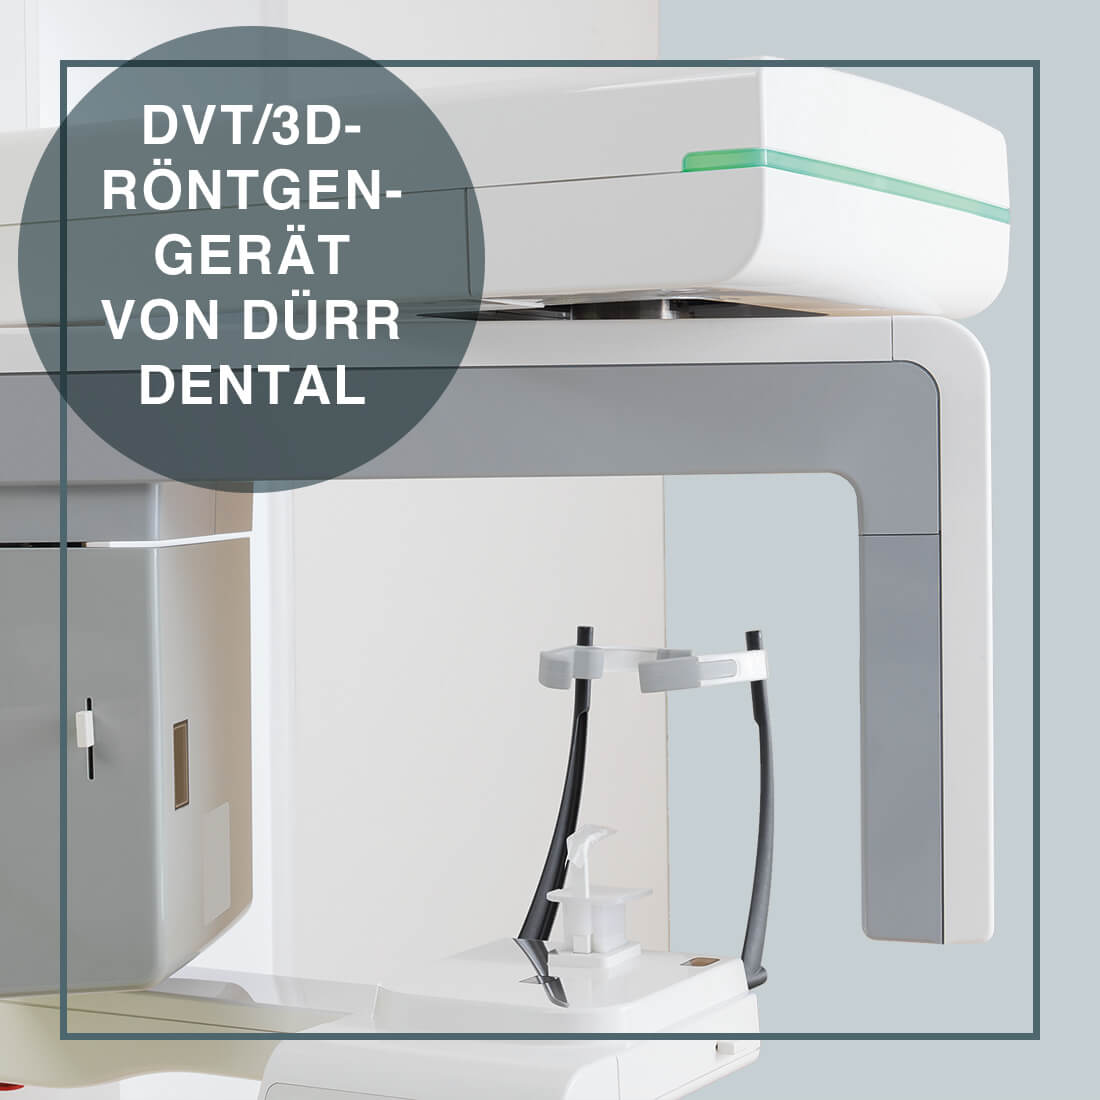 Röntgengerät Dürr Dental